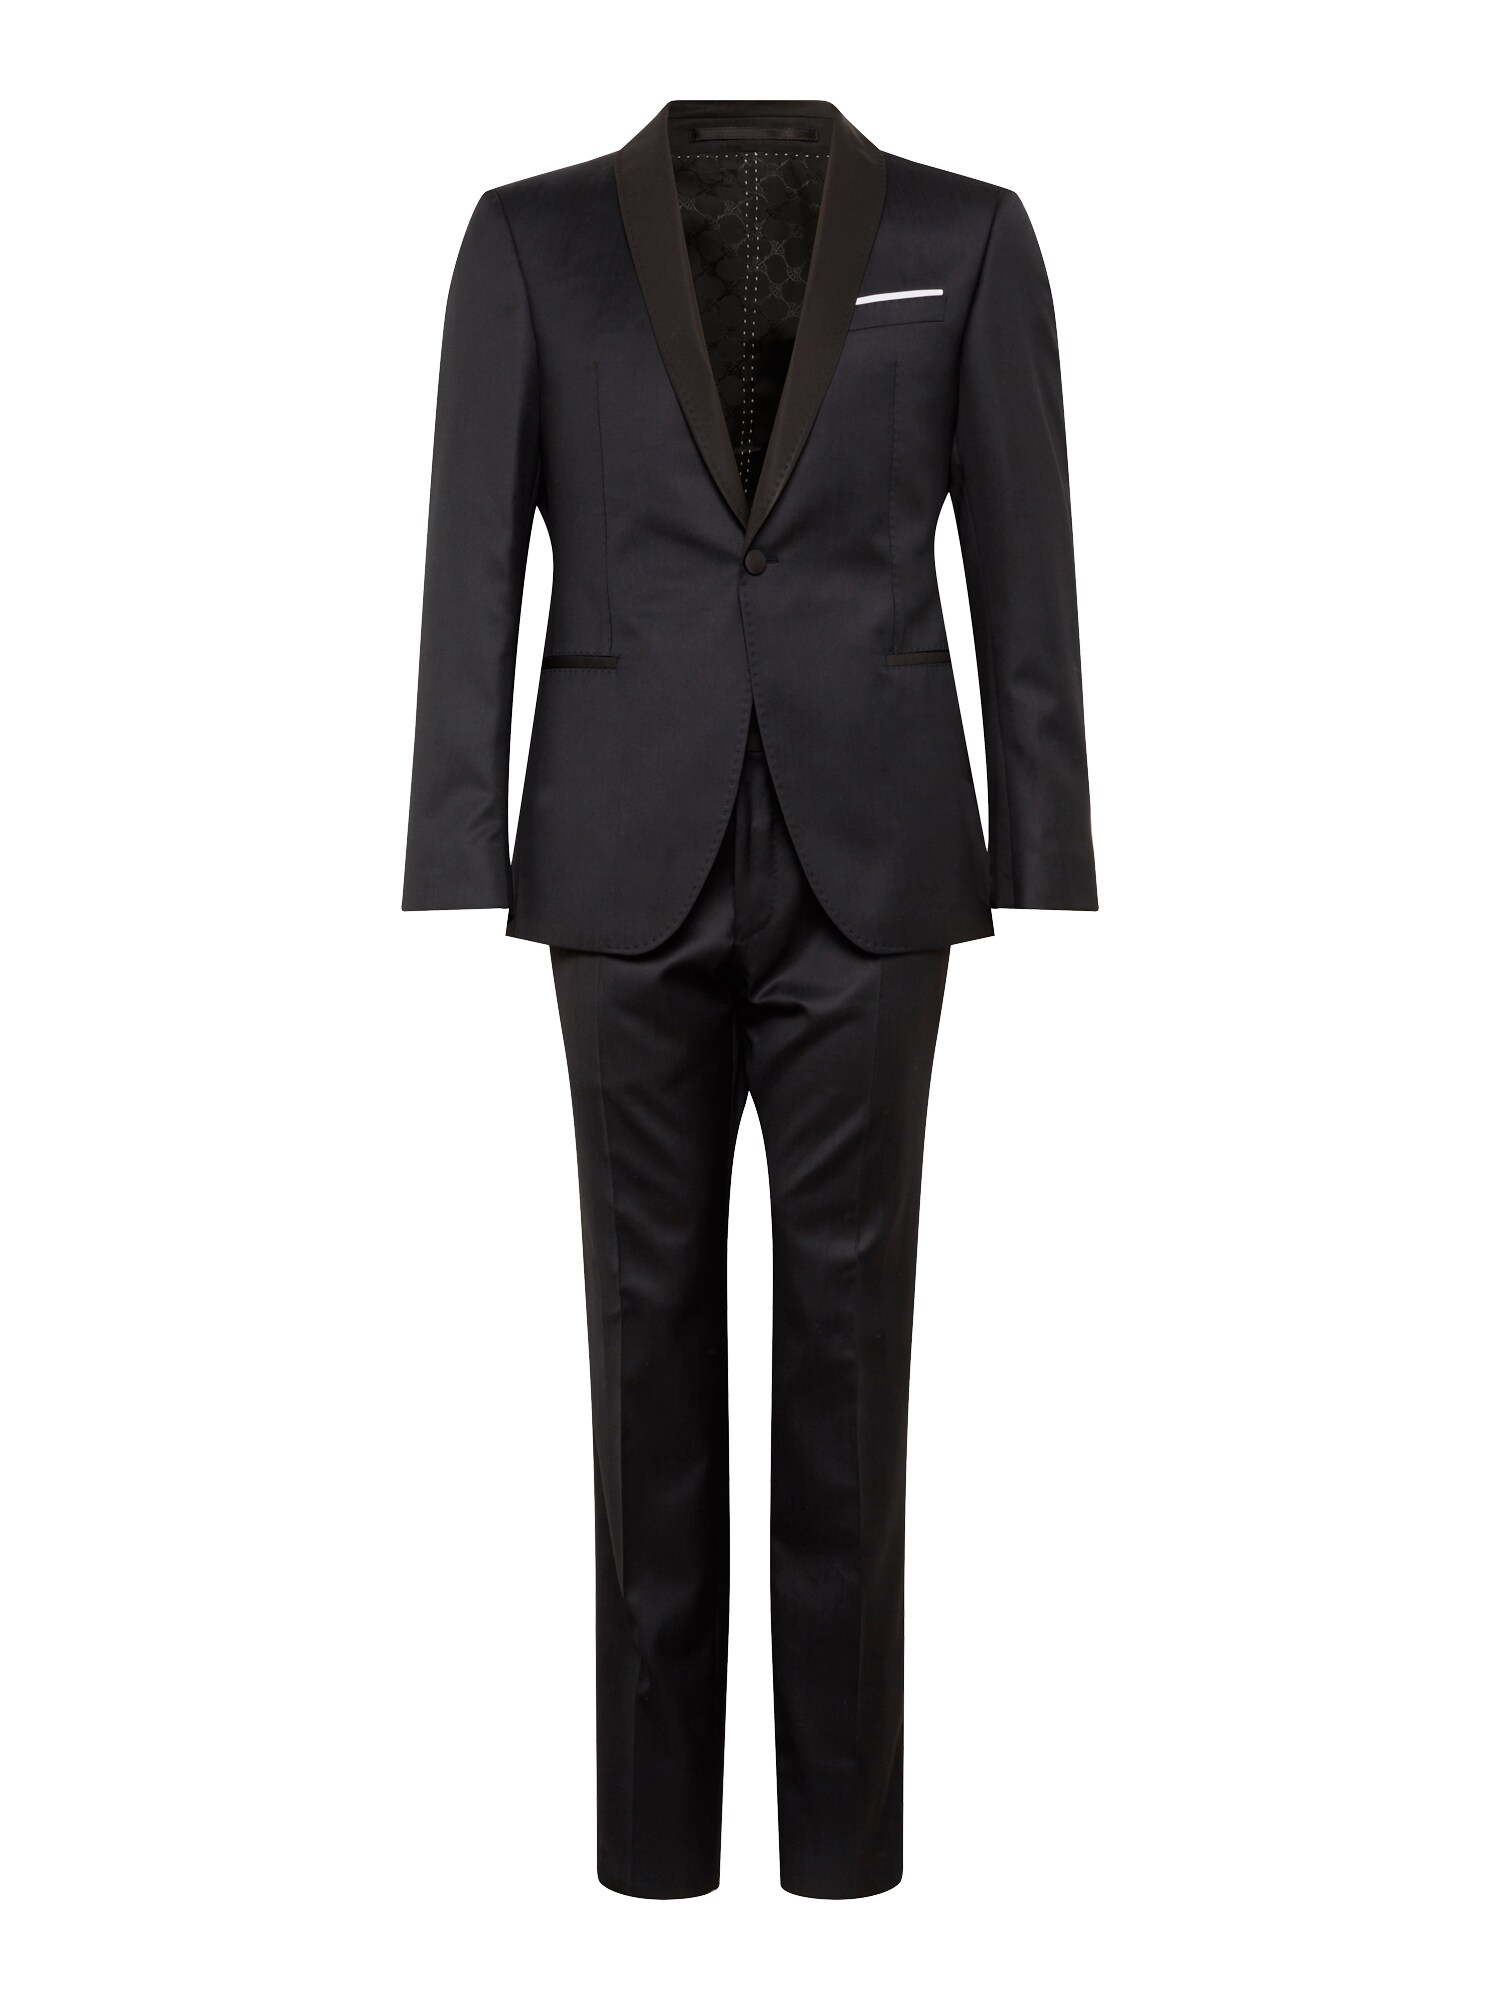 Oblek 17 JS-41Hive-Bond 10004540 černá JOOP!